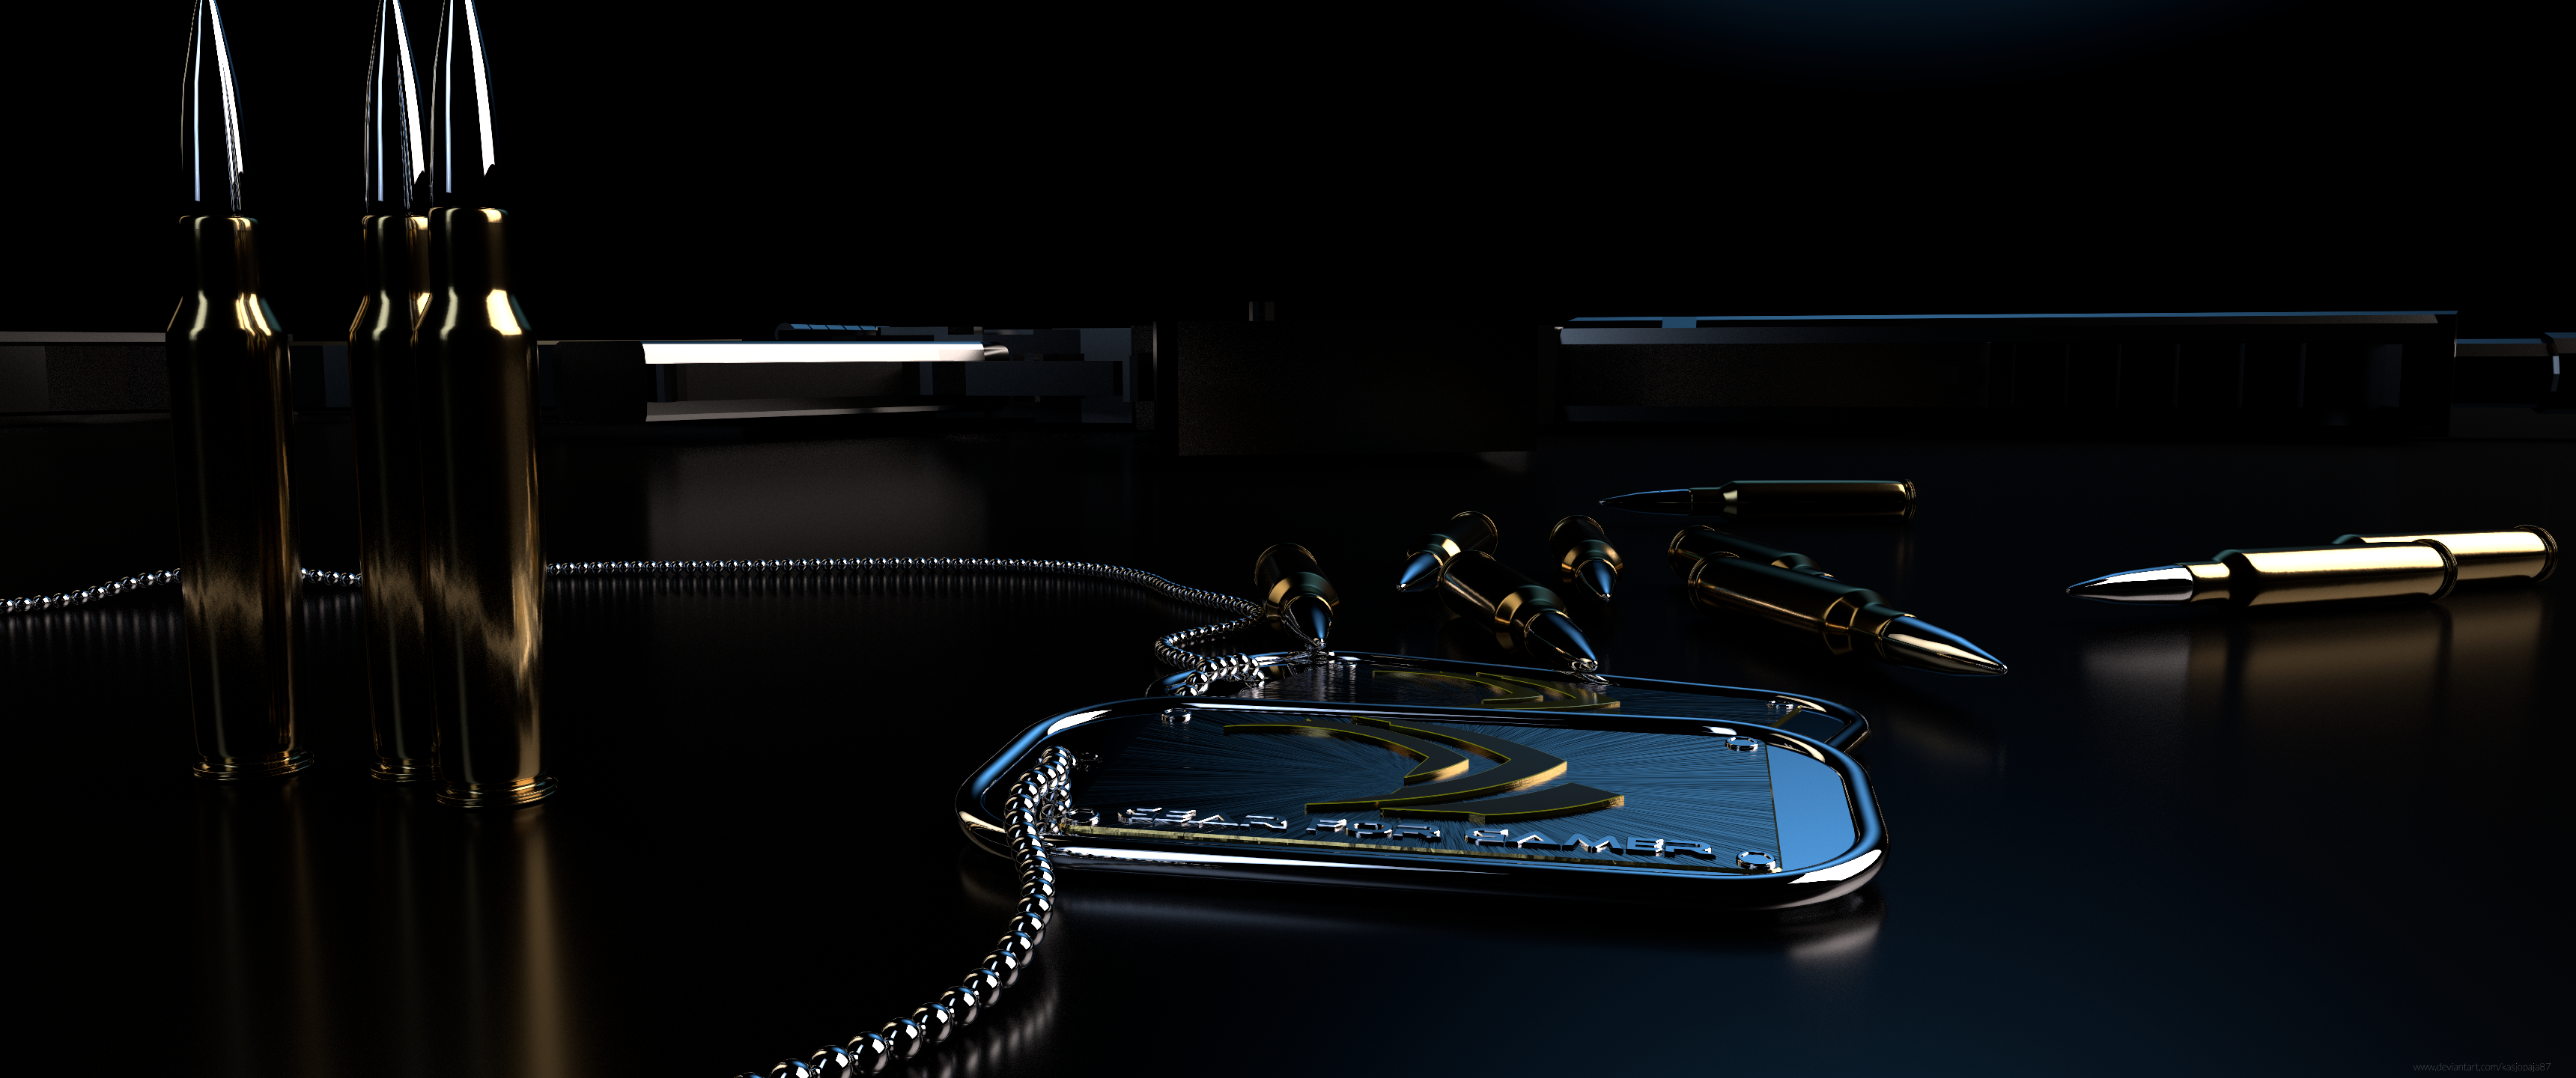 General 3440x1440 Nvidia UWQHD ammunition CGI render digital art